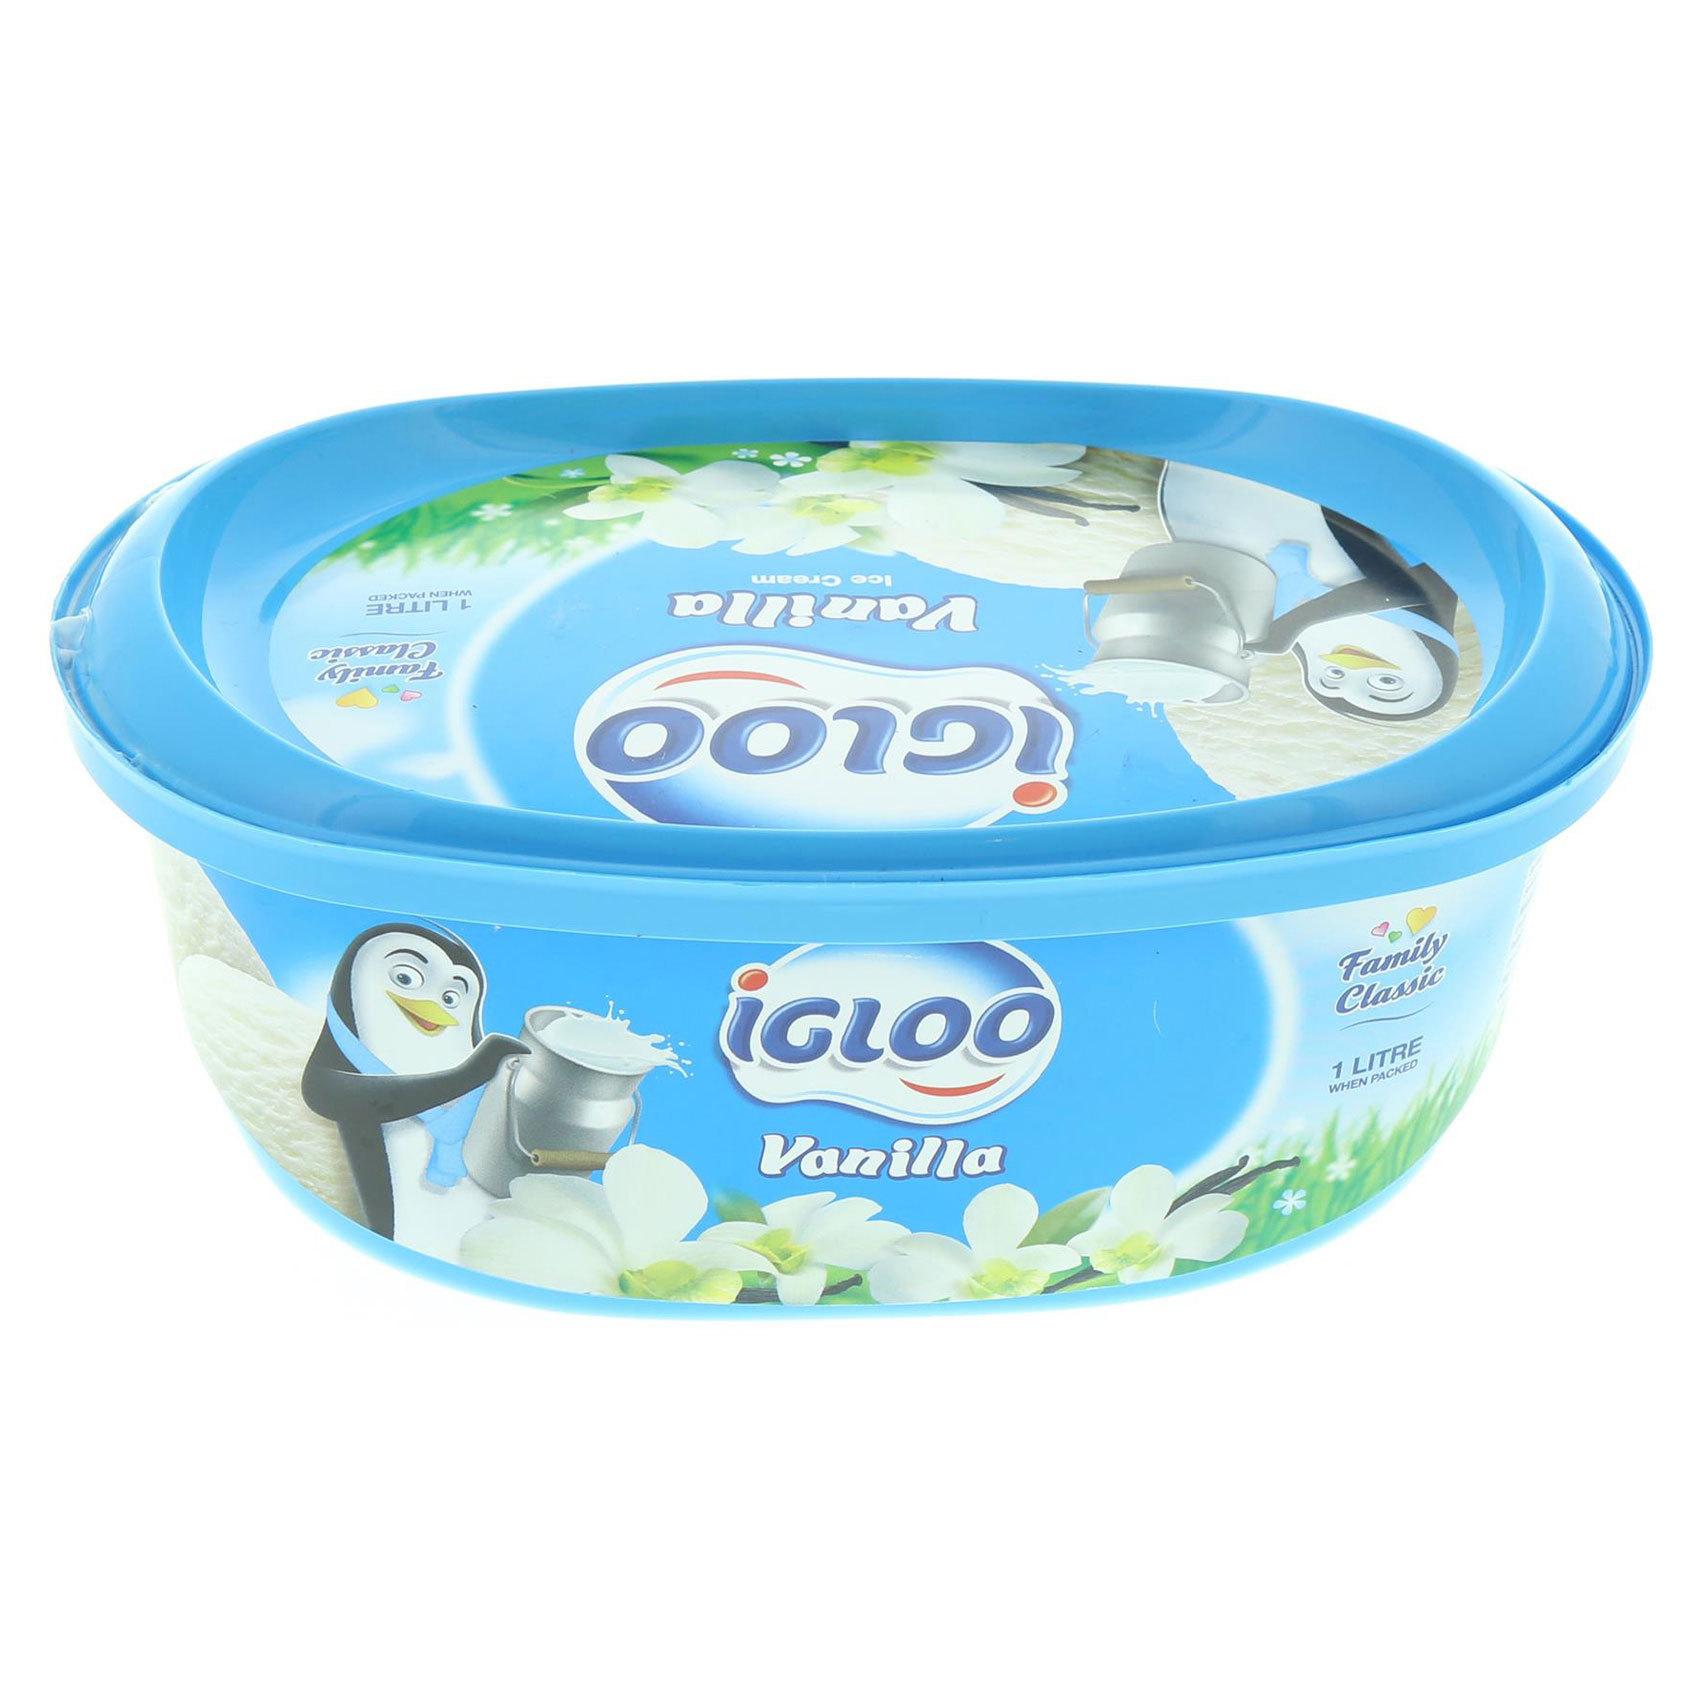 IGLOO ICE CREAM VANILLA 1L